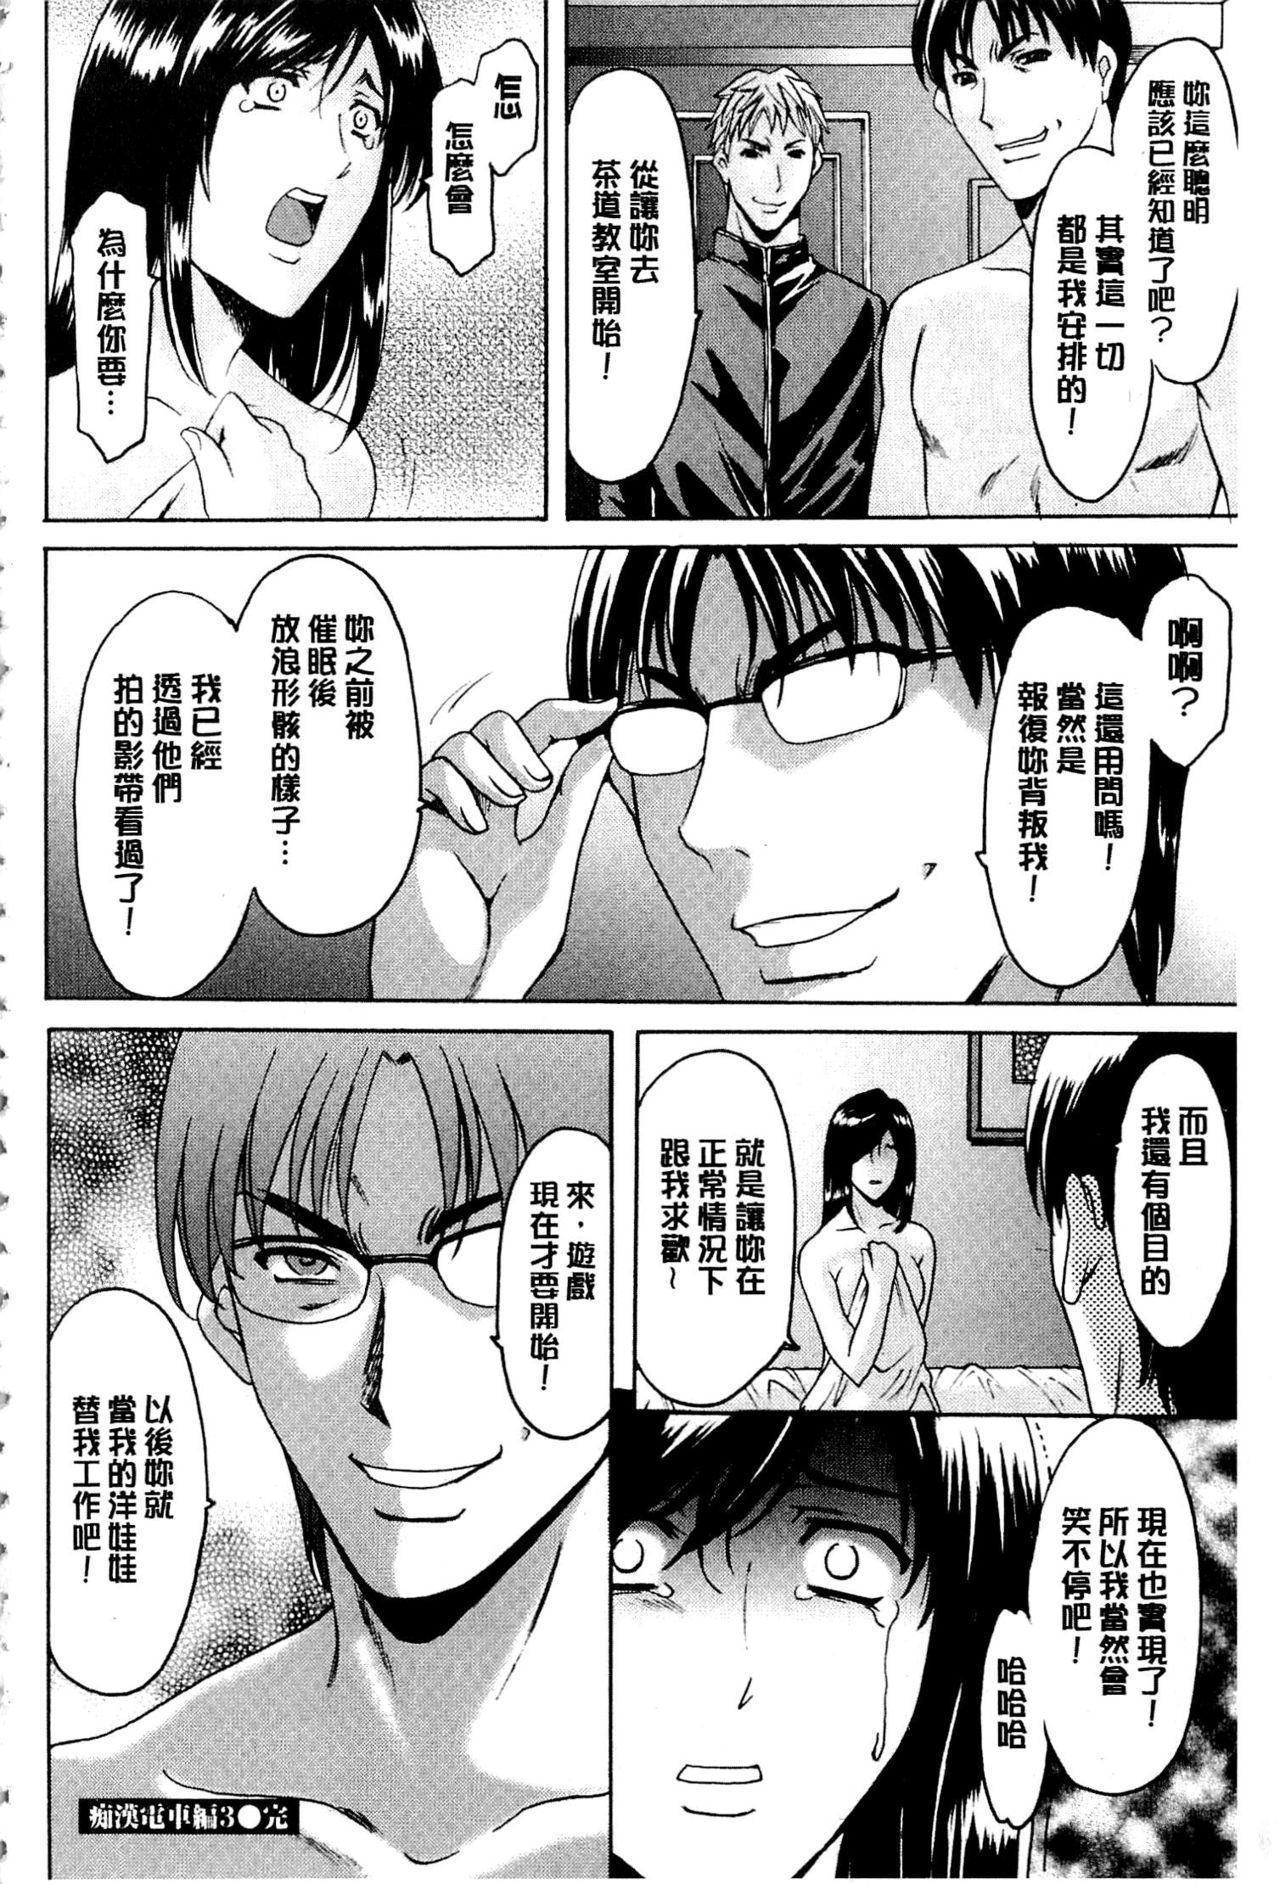 Sennyu Tsuma Satomi Kiroku   臥底人妻里美 洗腦凌辱的記錄 下集 68